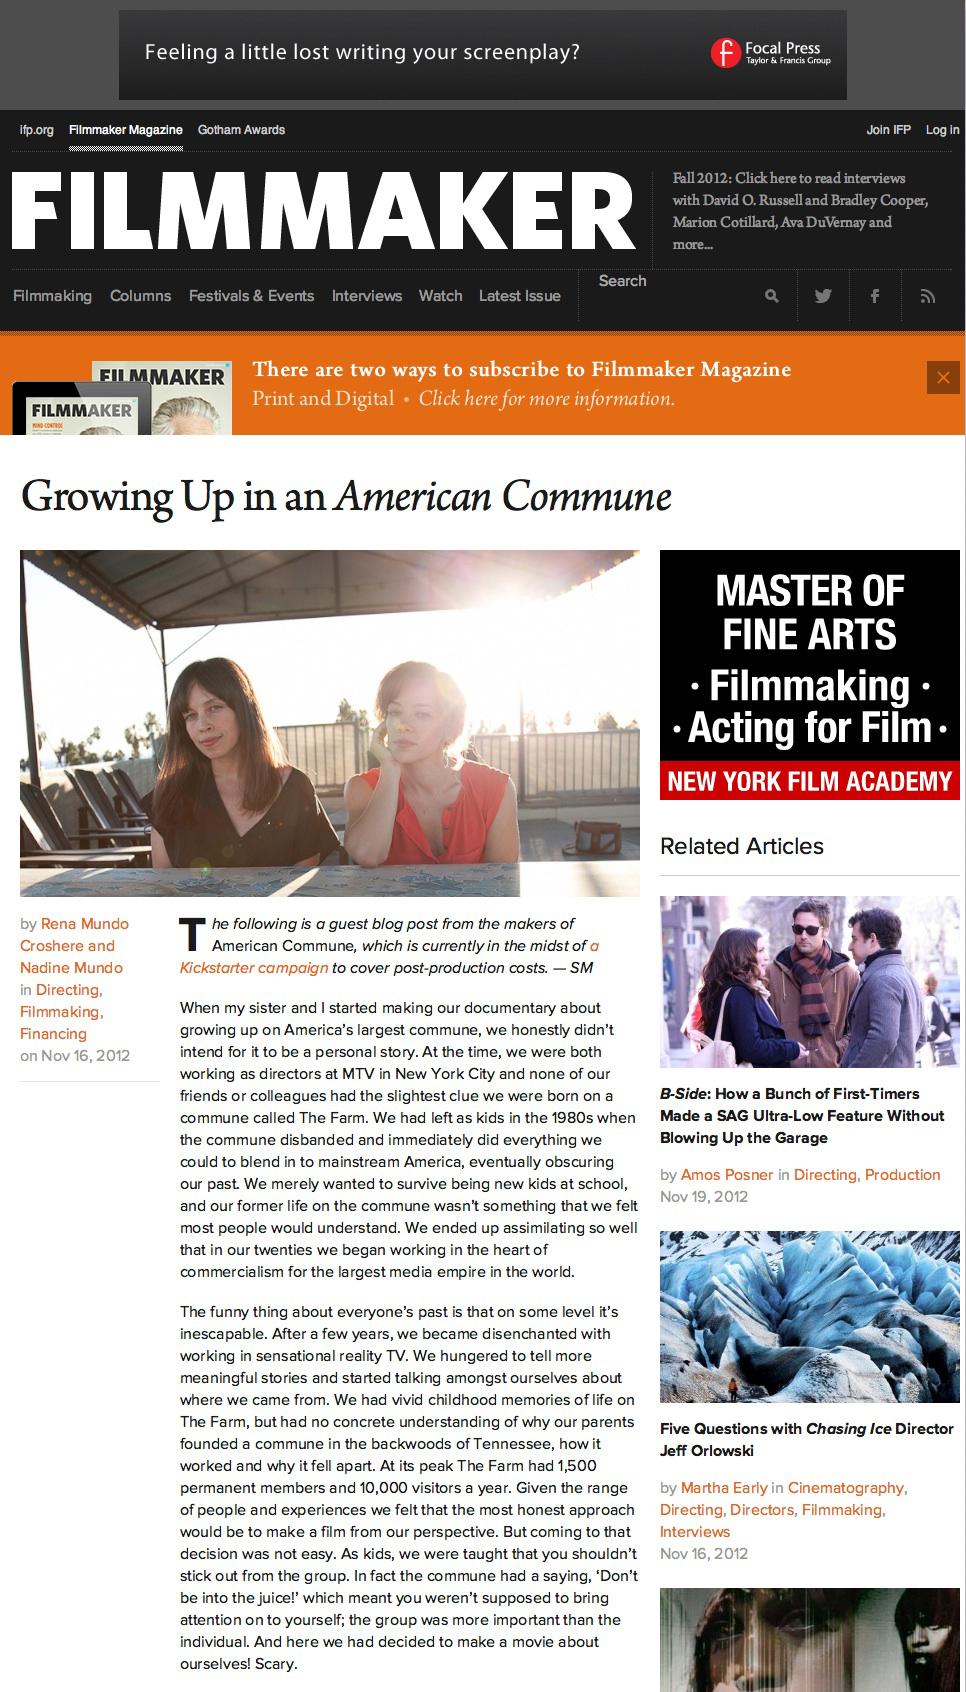 Growing Up in an American Commune | Filmmaker Magazine (20121120).jpg